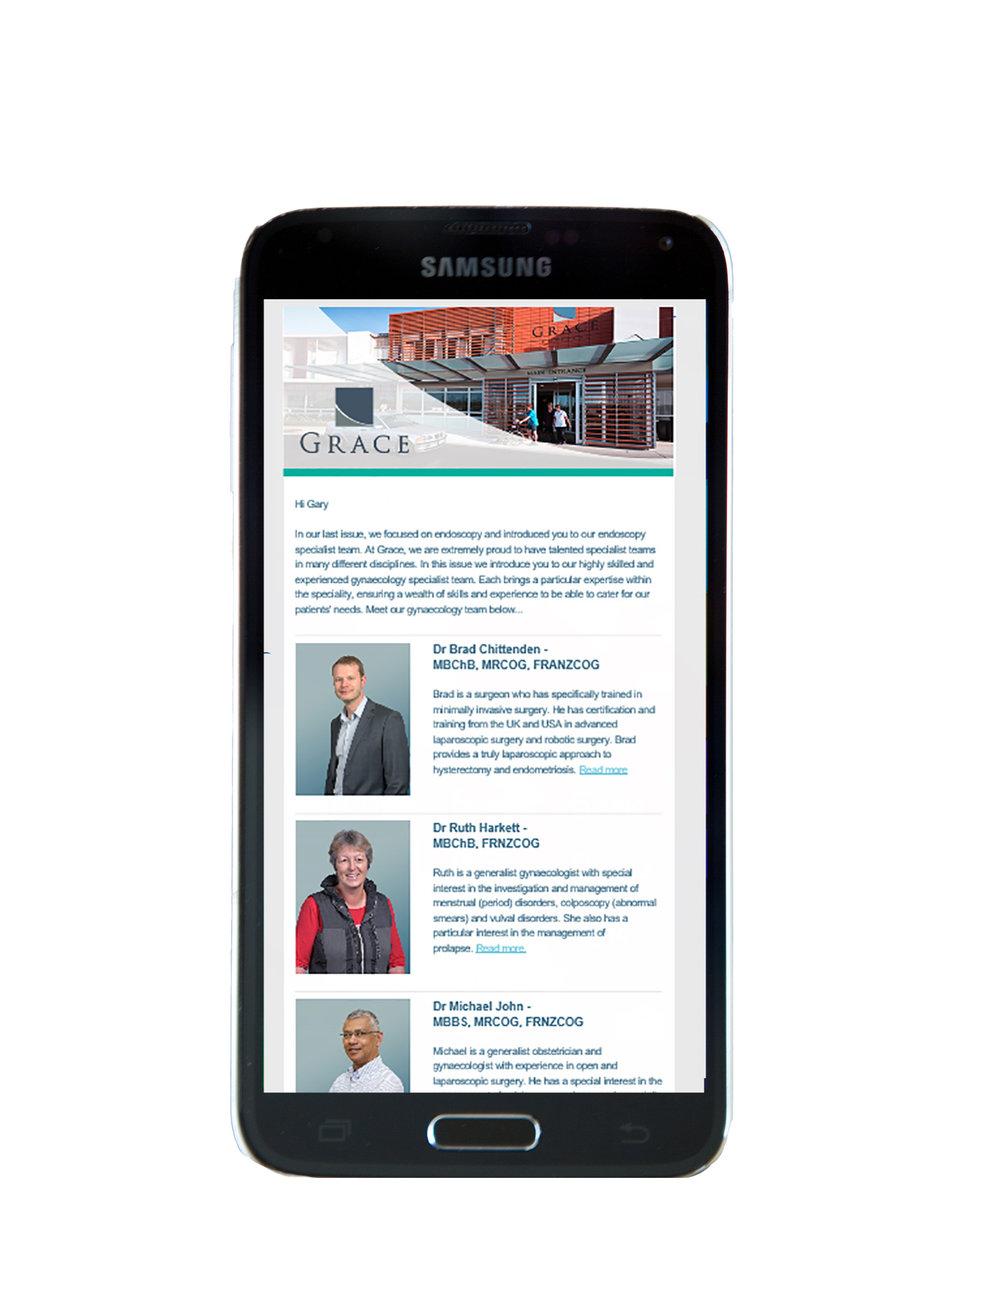 Samsung-1GH NL-2.jpg